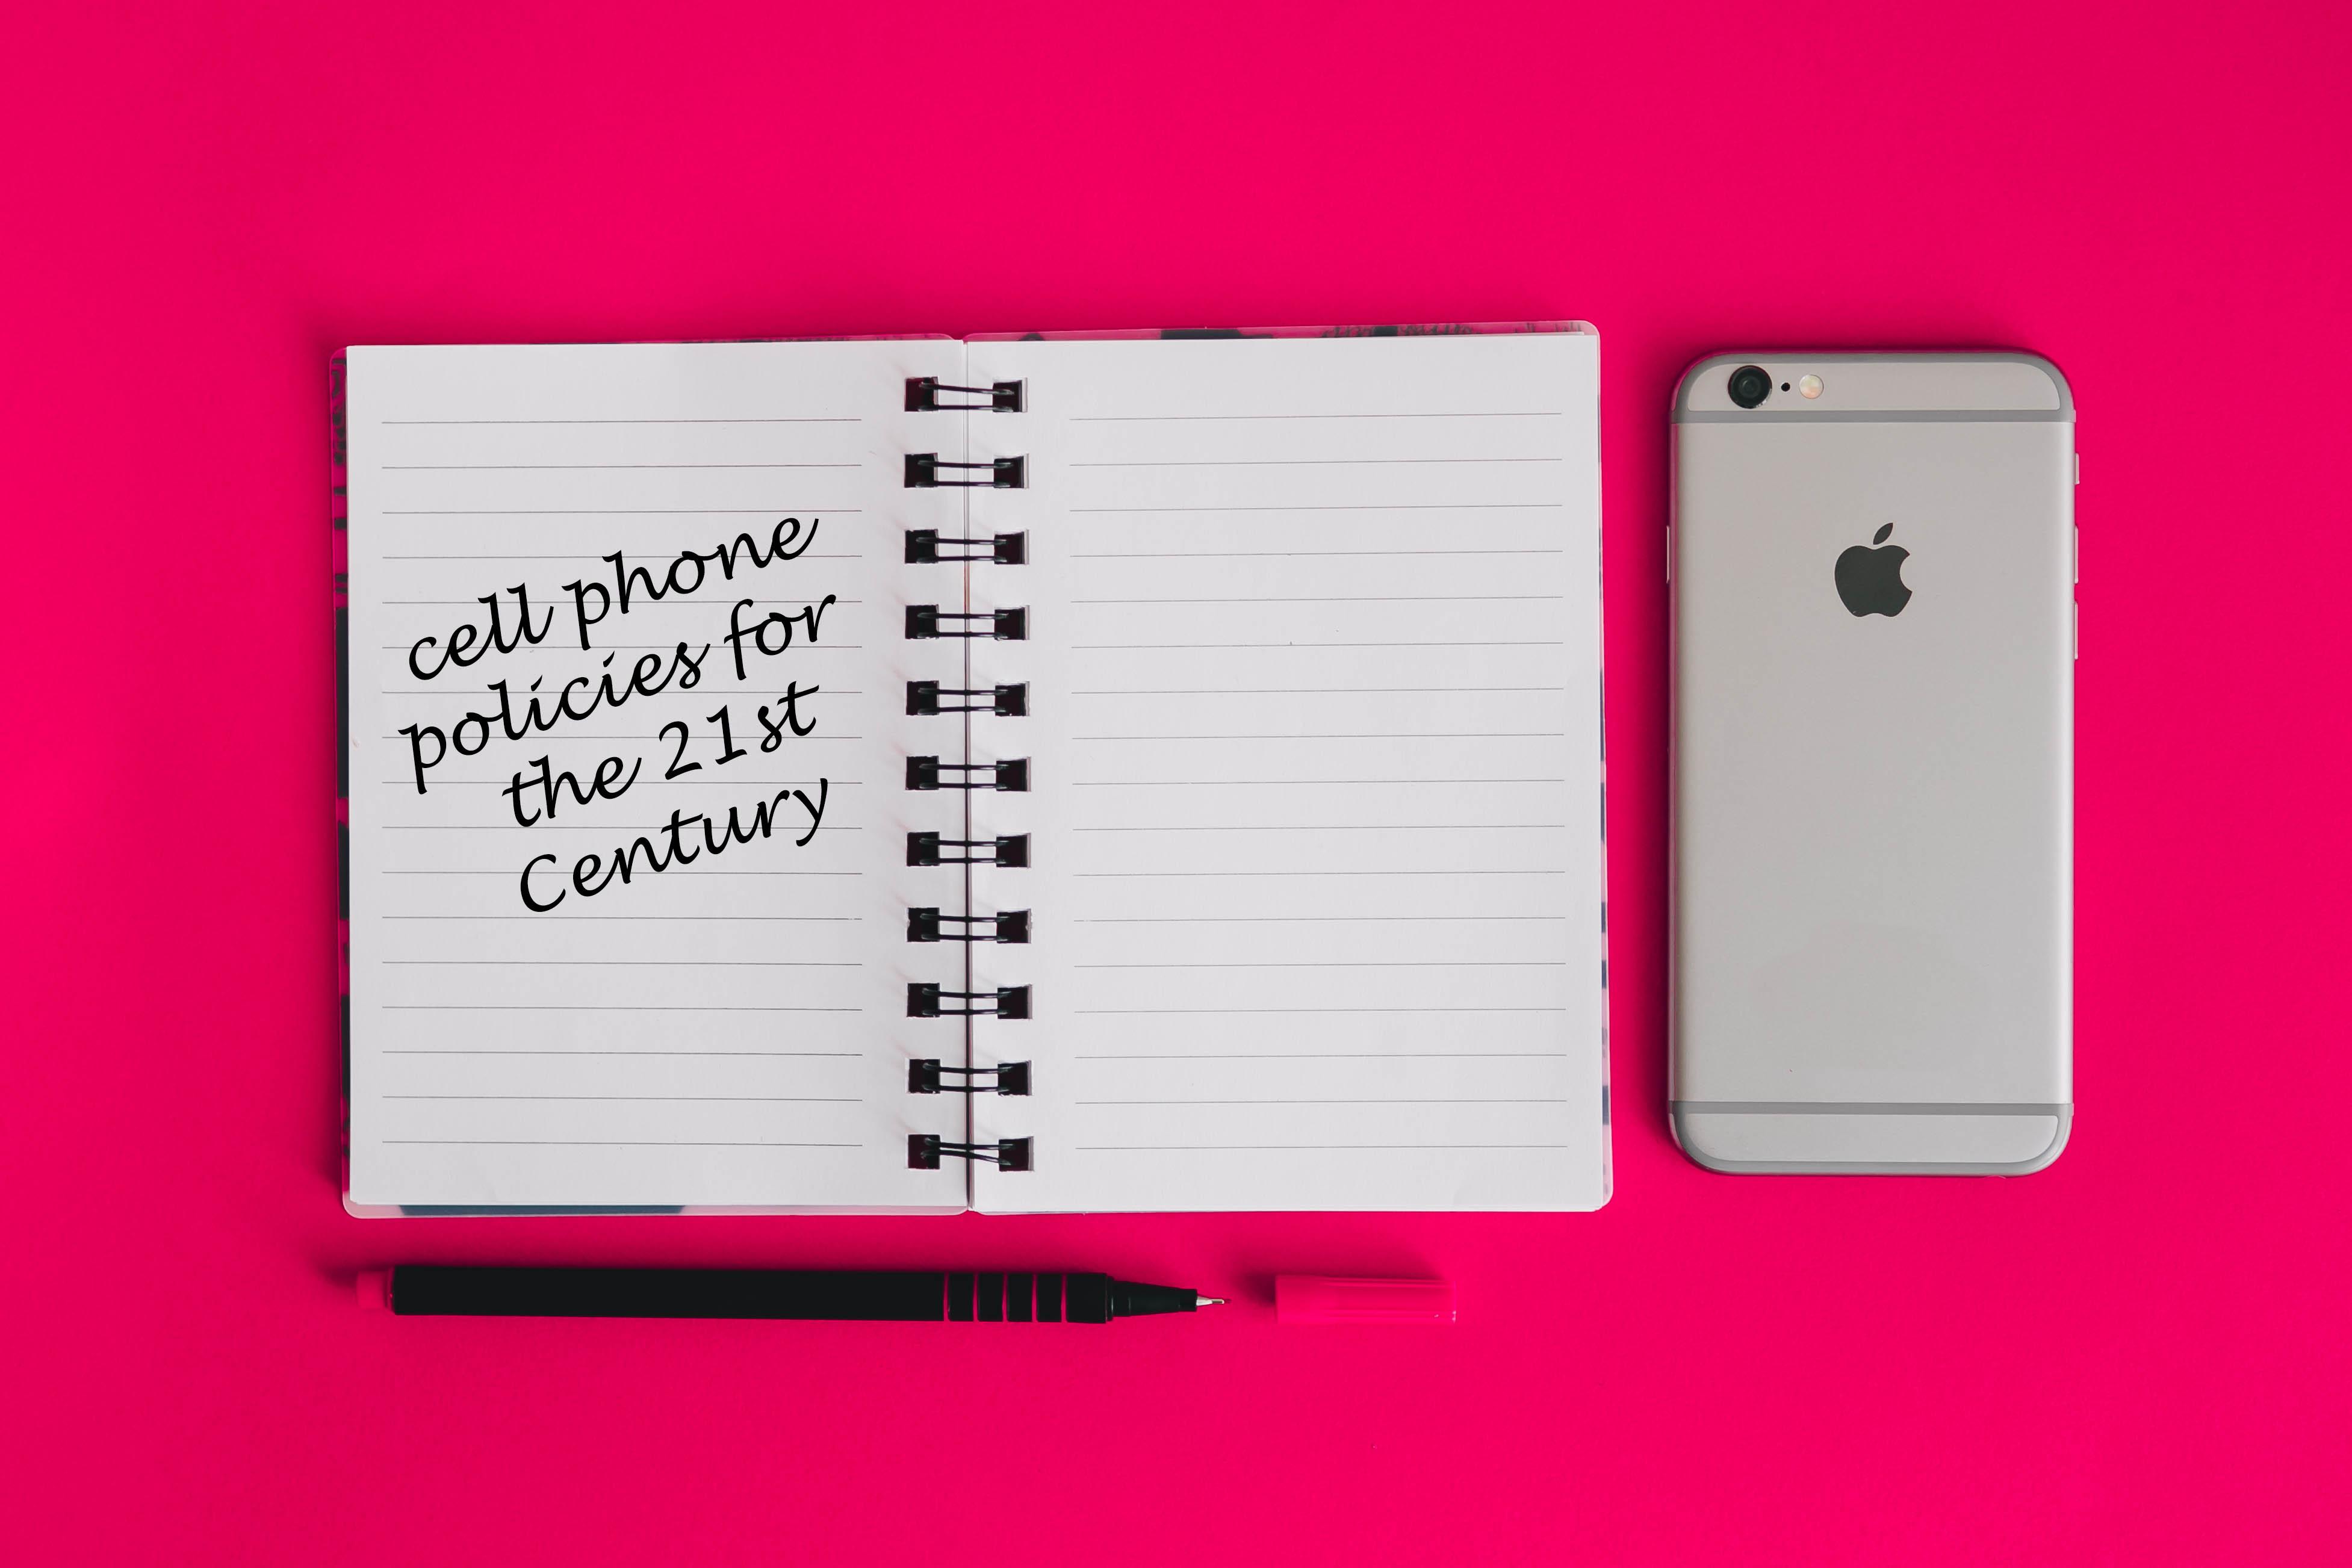 Cell_Phone_Policies.jpg